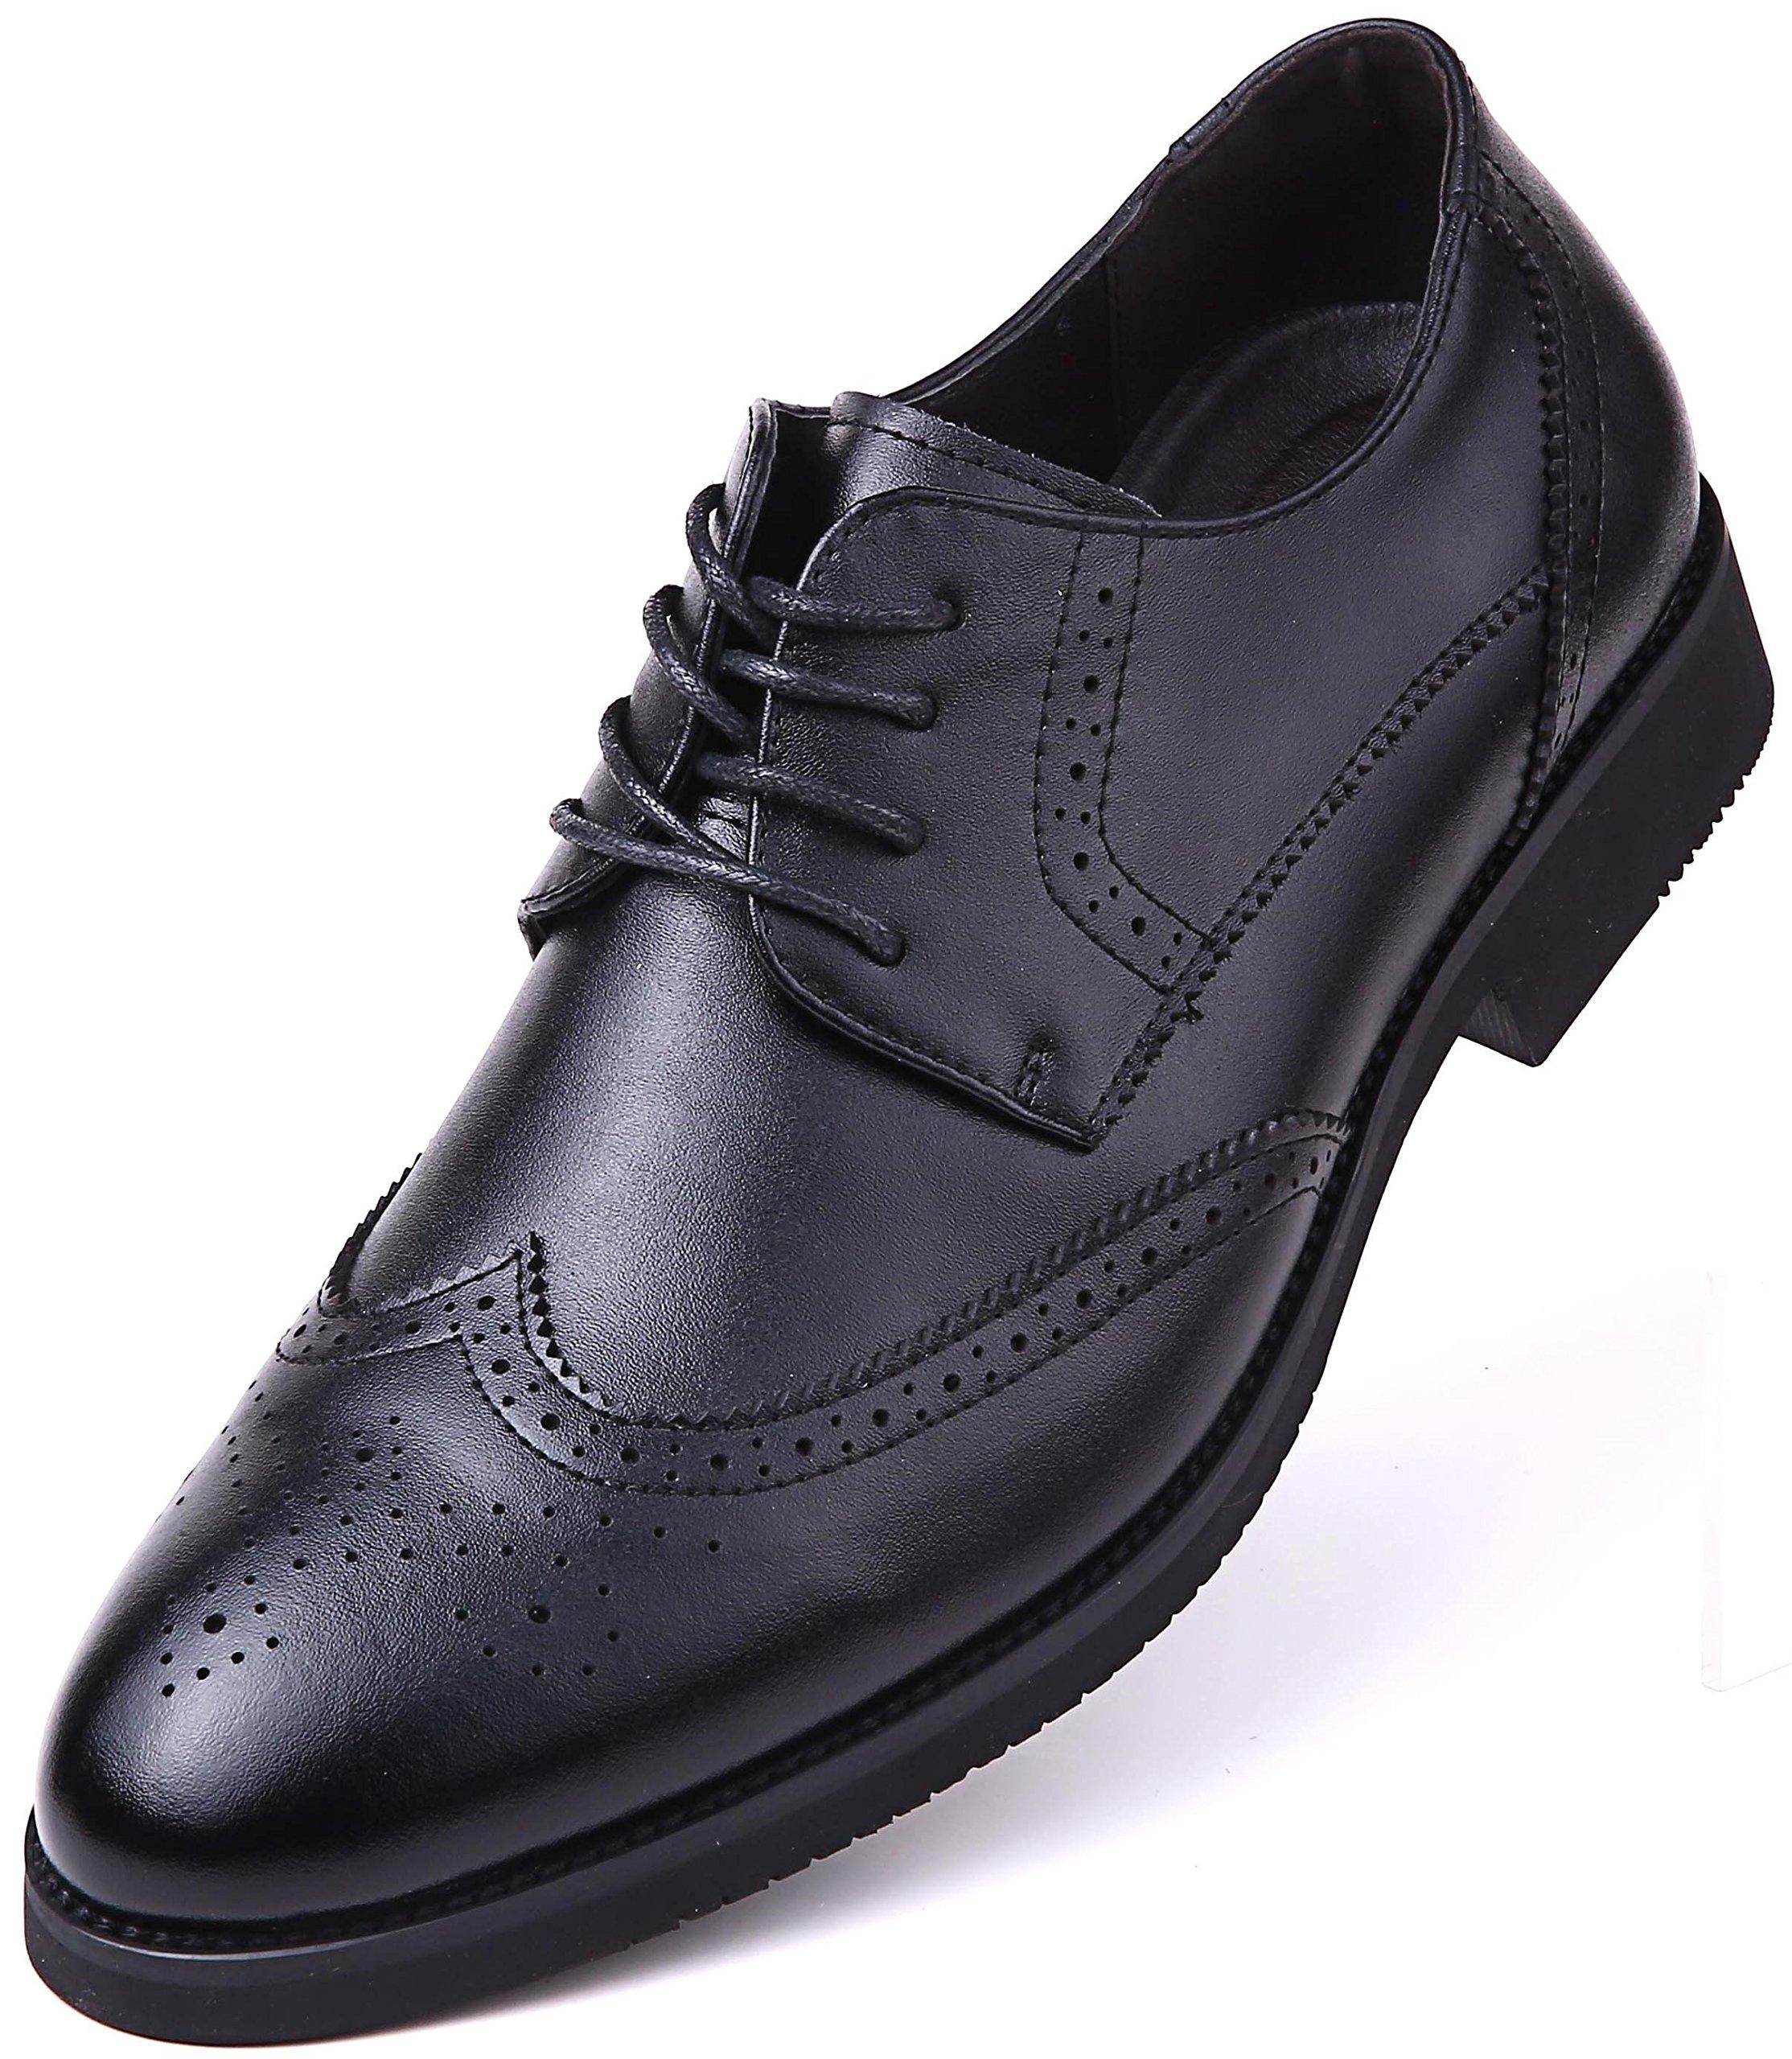 Dressports Wingtip Shoes, Black - Wingtip, 10.5 D(M) US,Black - Wingtip